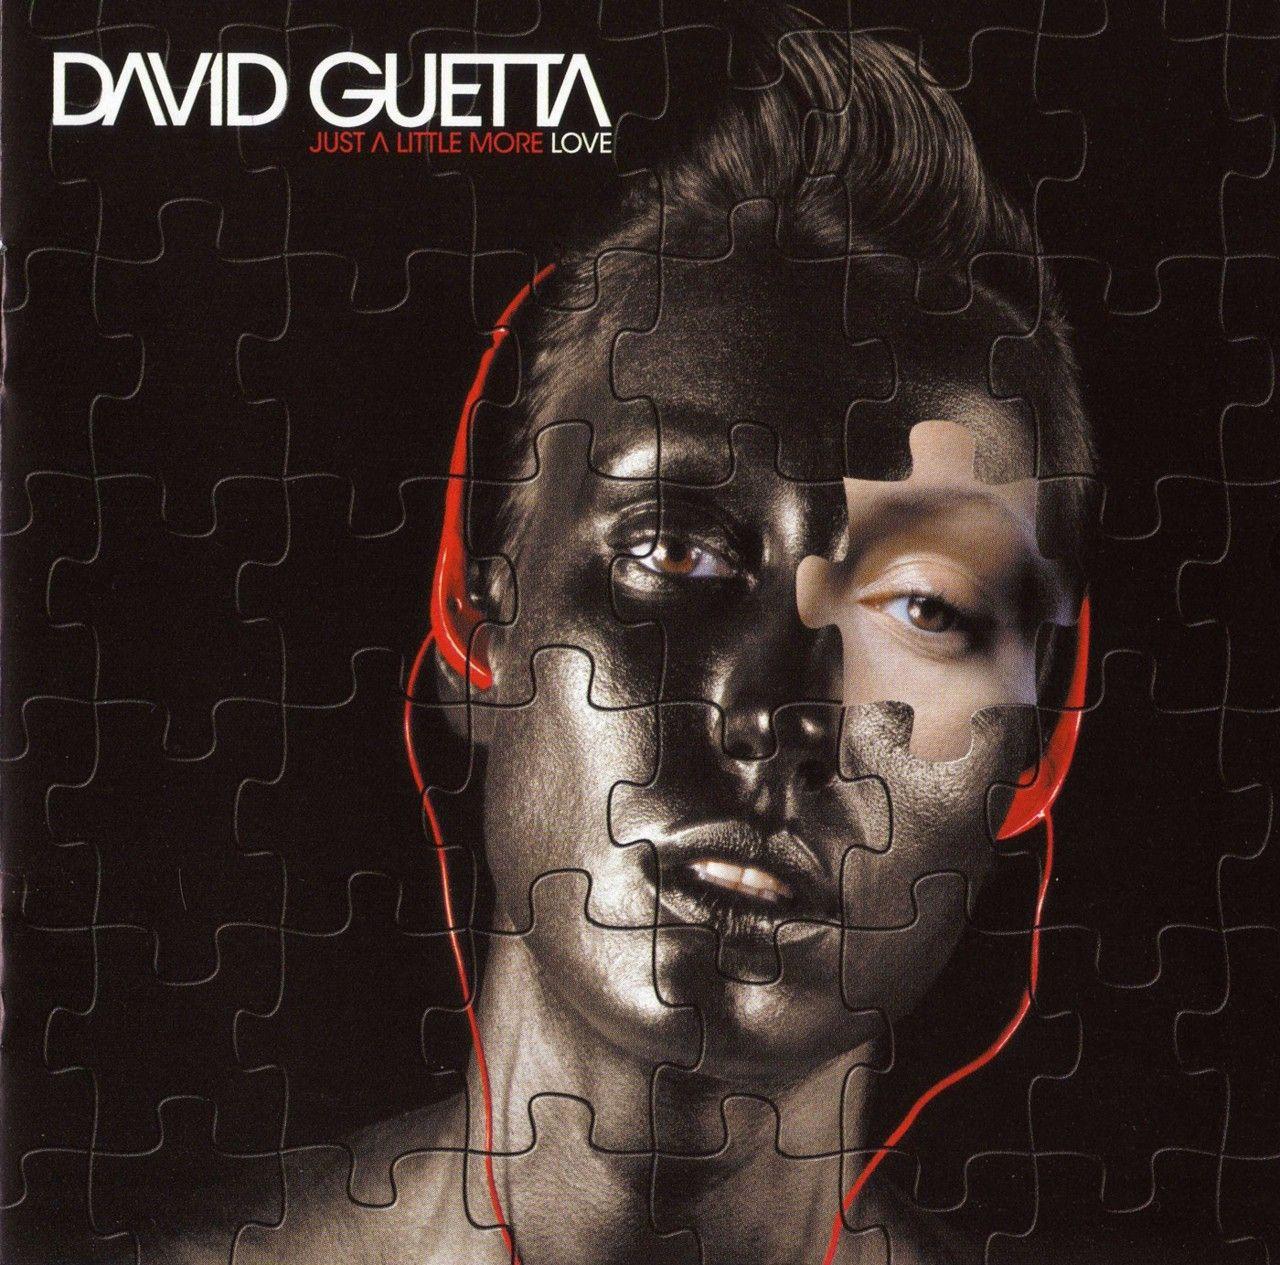 David Guetta Just a Little More Love 2002 (c) EMI/Virgin